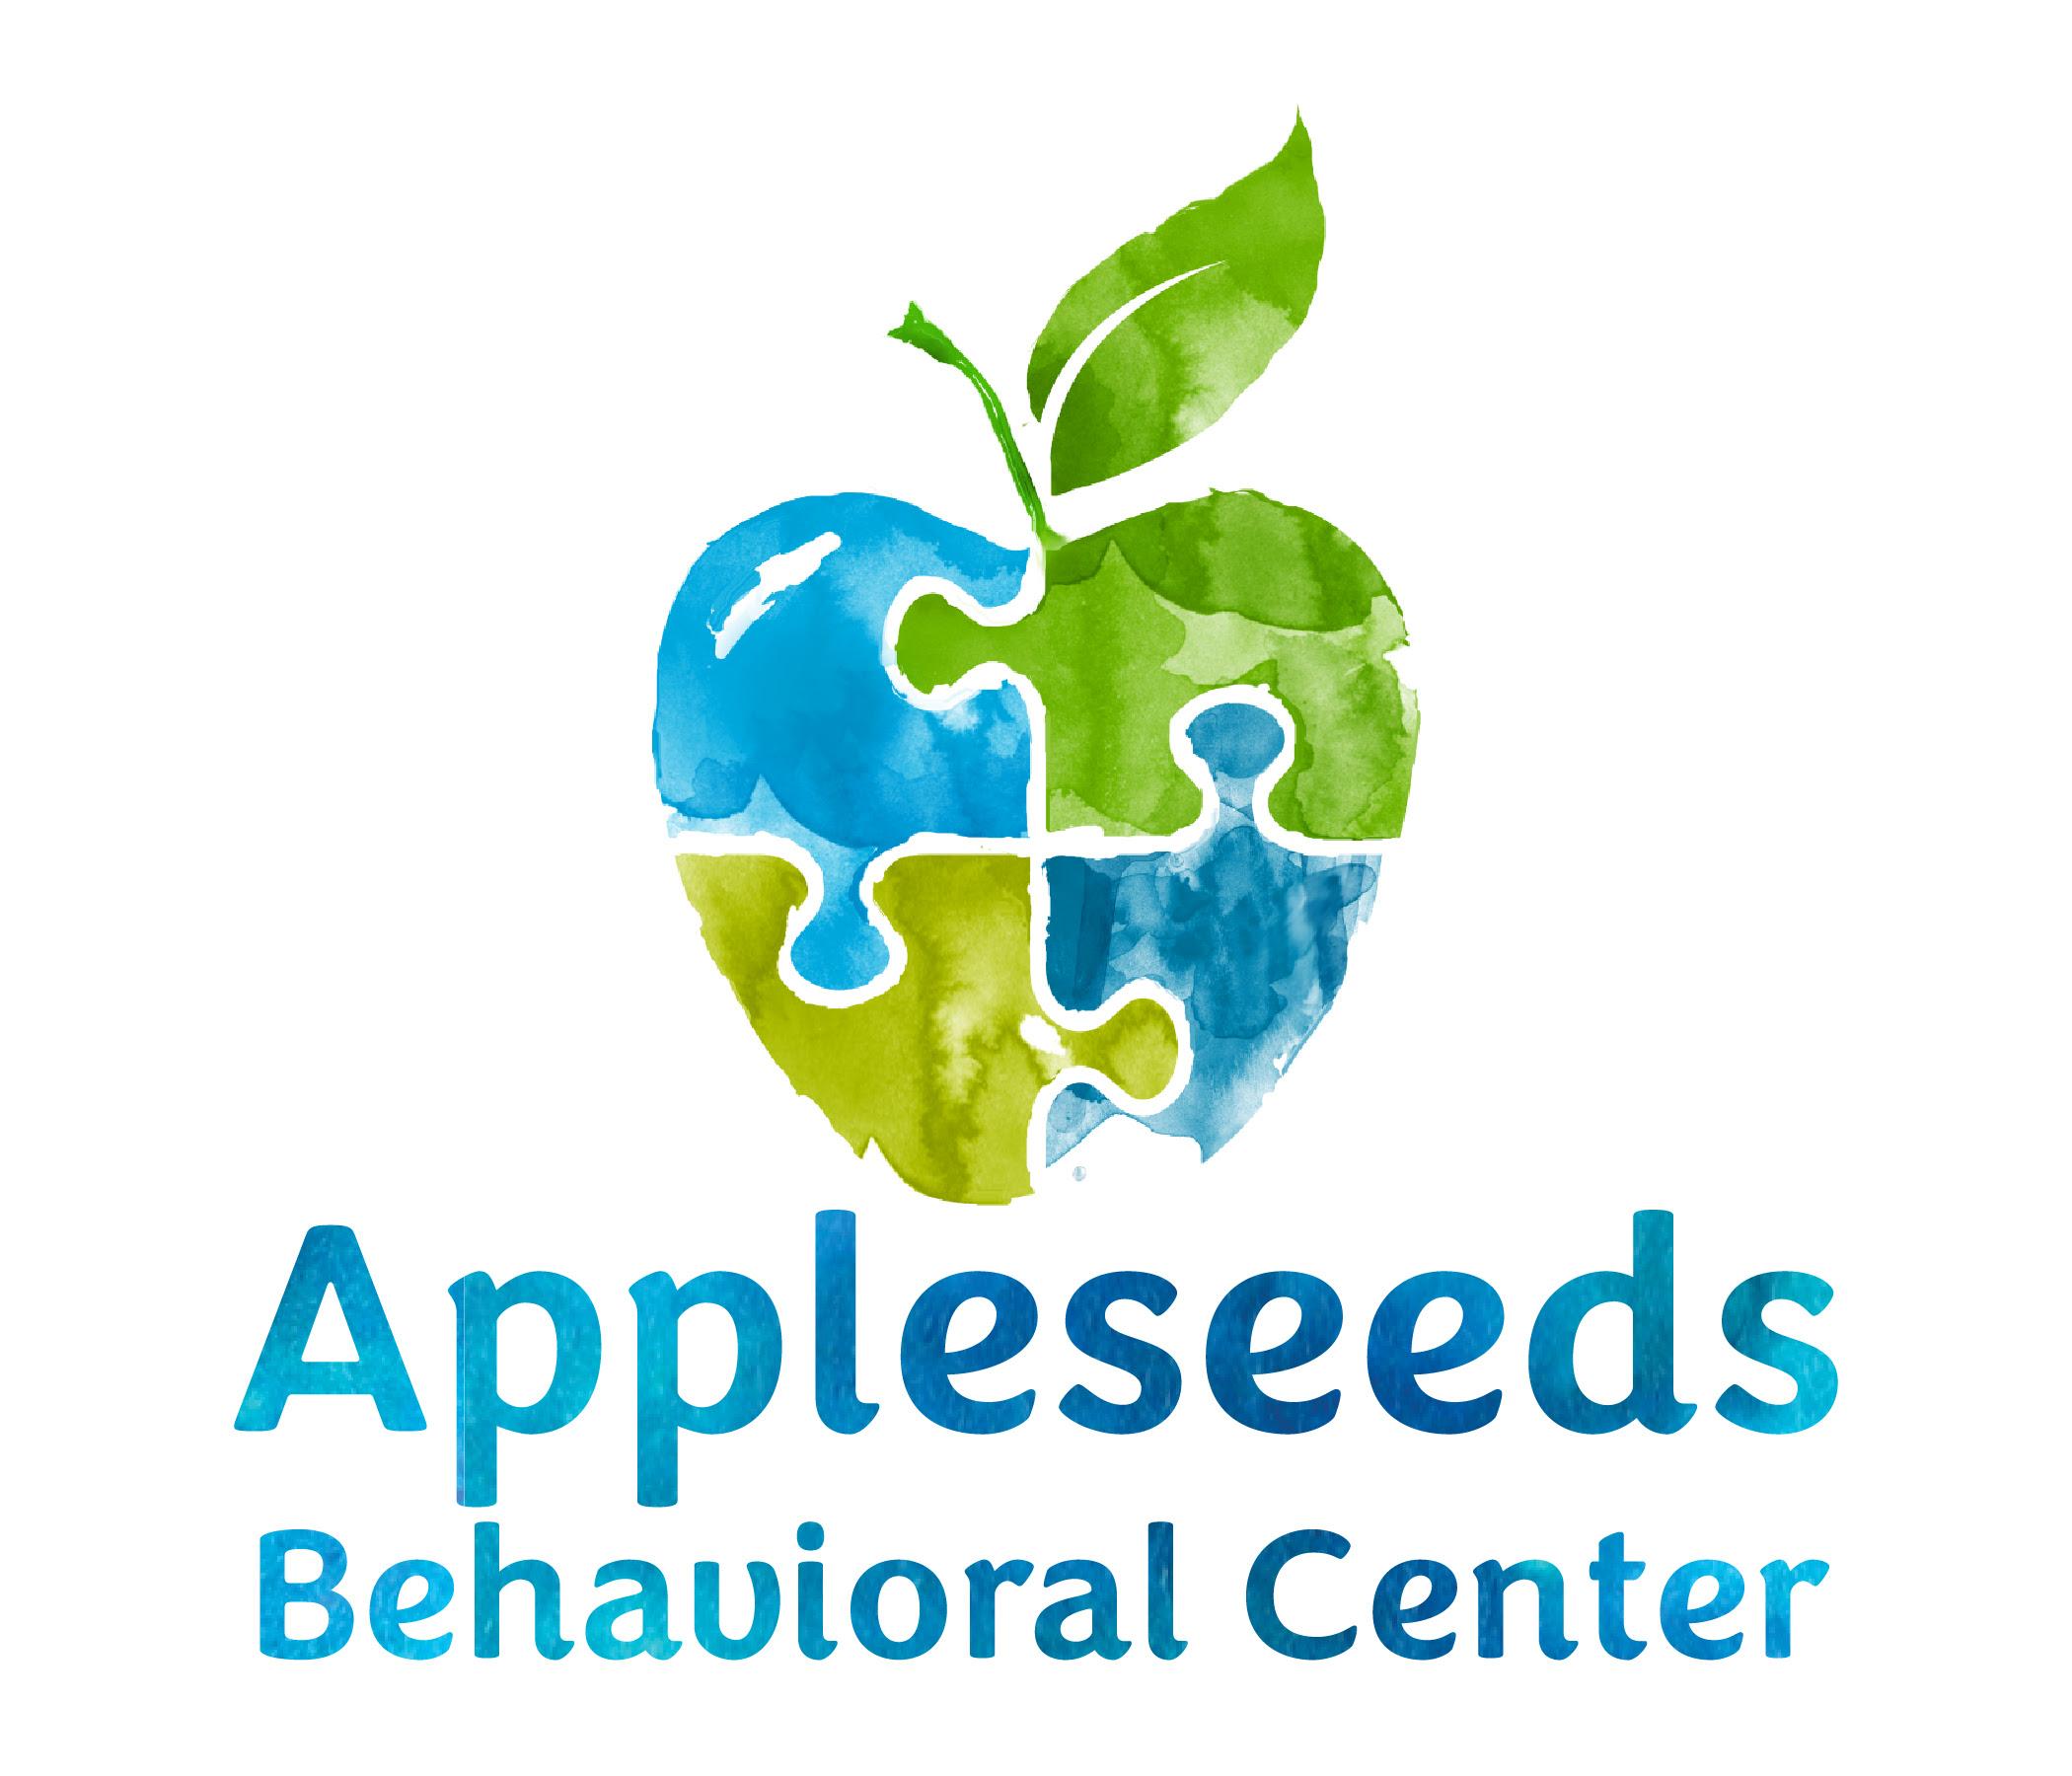 Appleseeds Behavioral Center